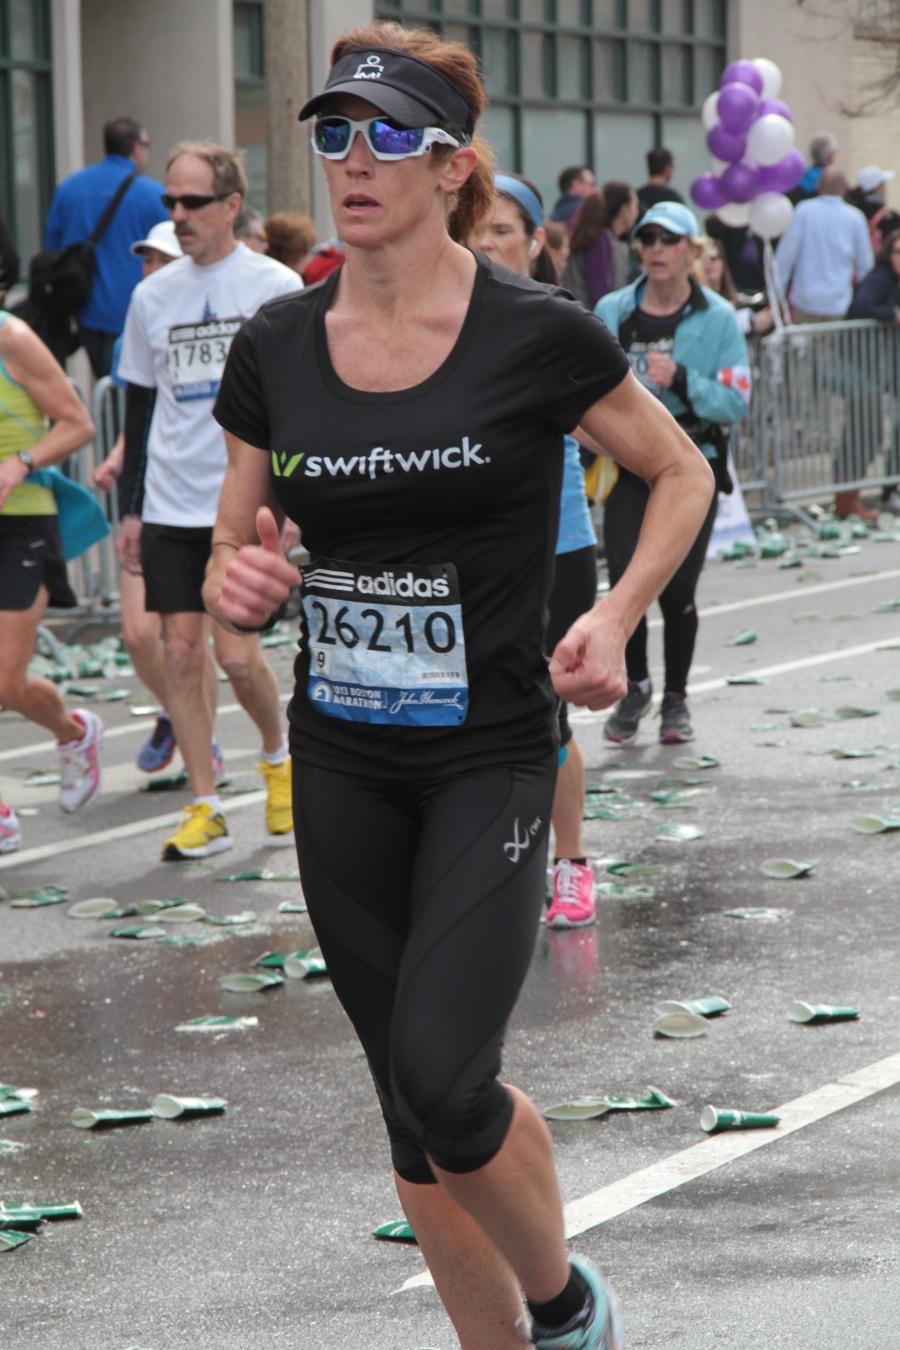 boston marathon 2013 9